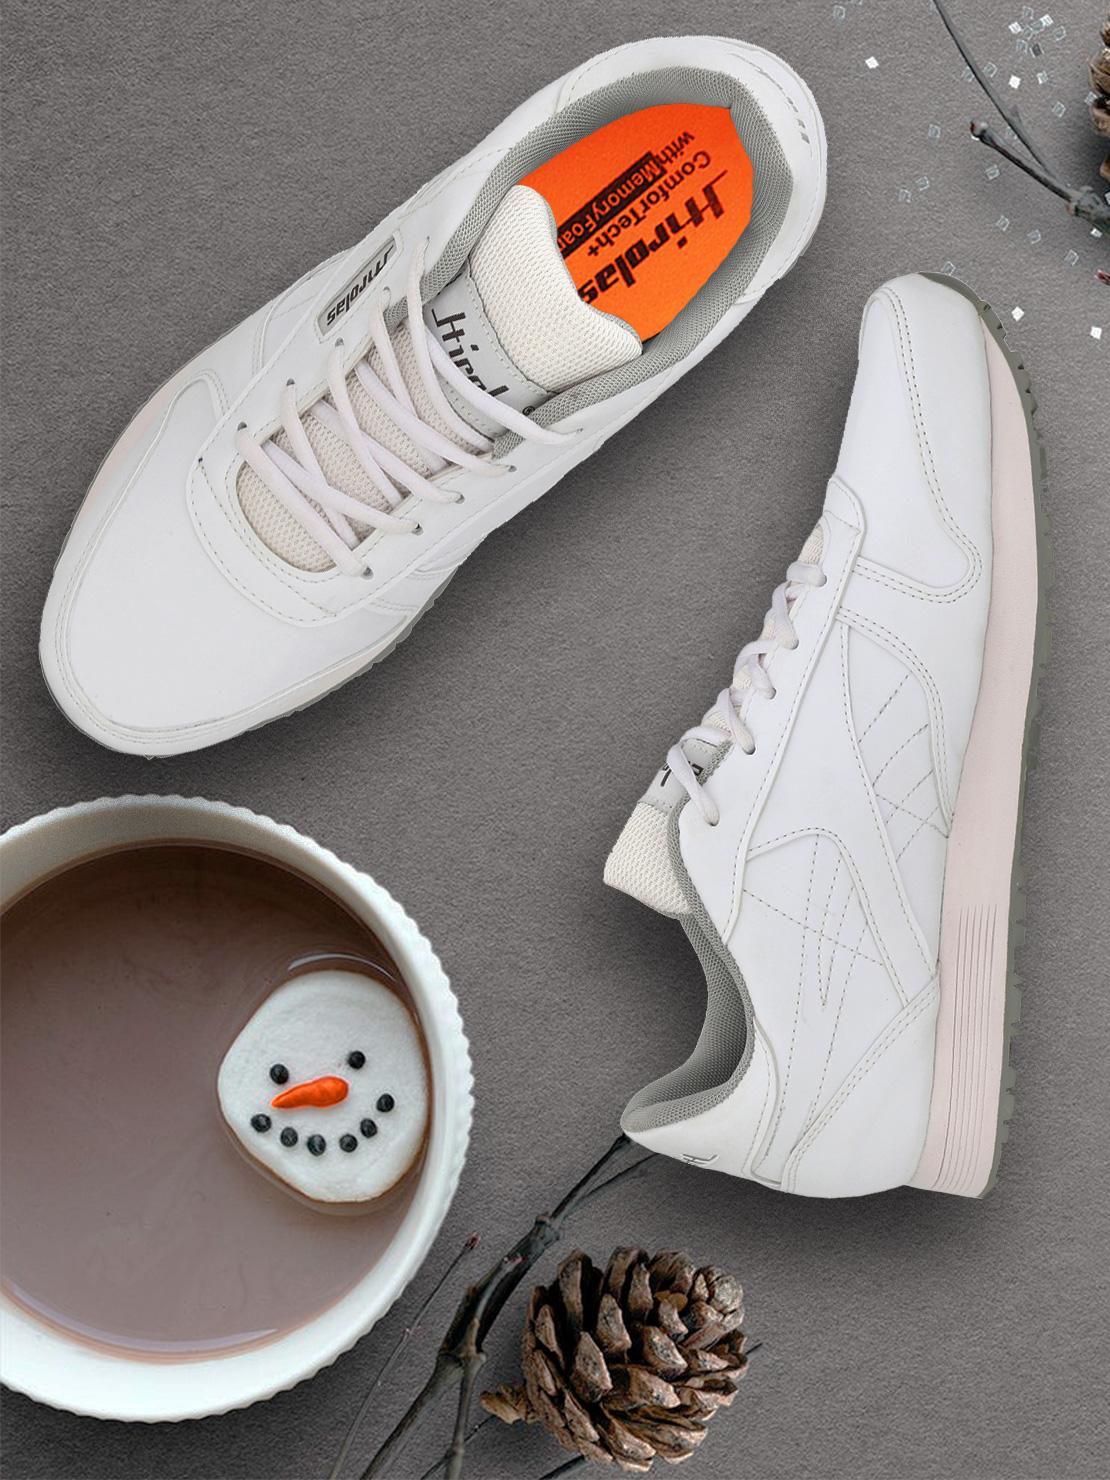 Hirolas | Hirolas Multi Sport Shock Absorbing Walking  Running Fitness Athletic Training Gym Sneaker Shoes - White/Grey